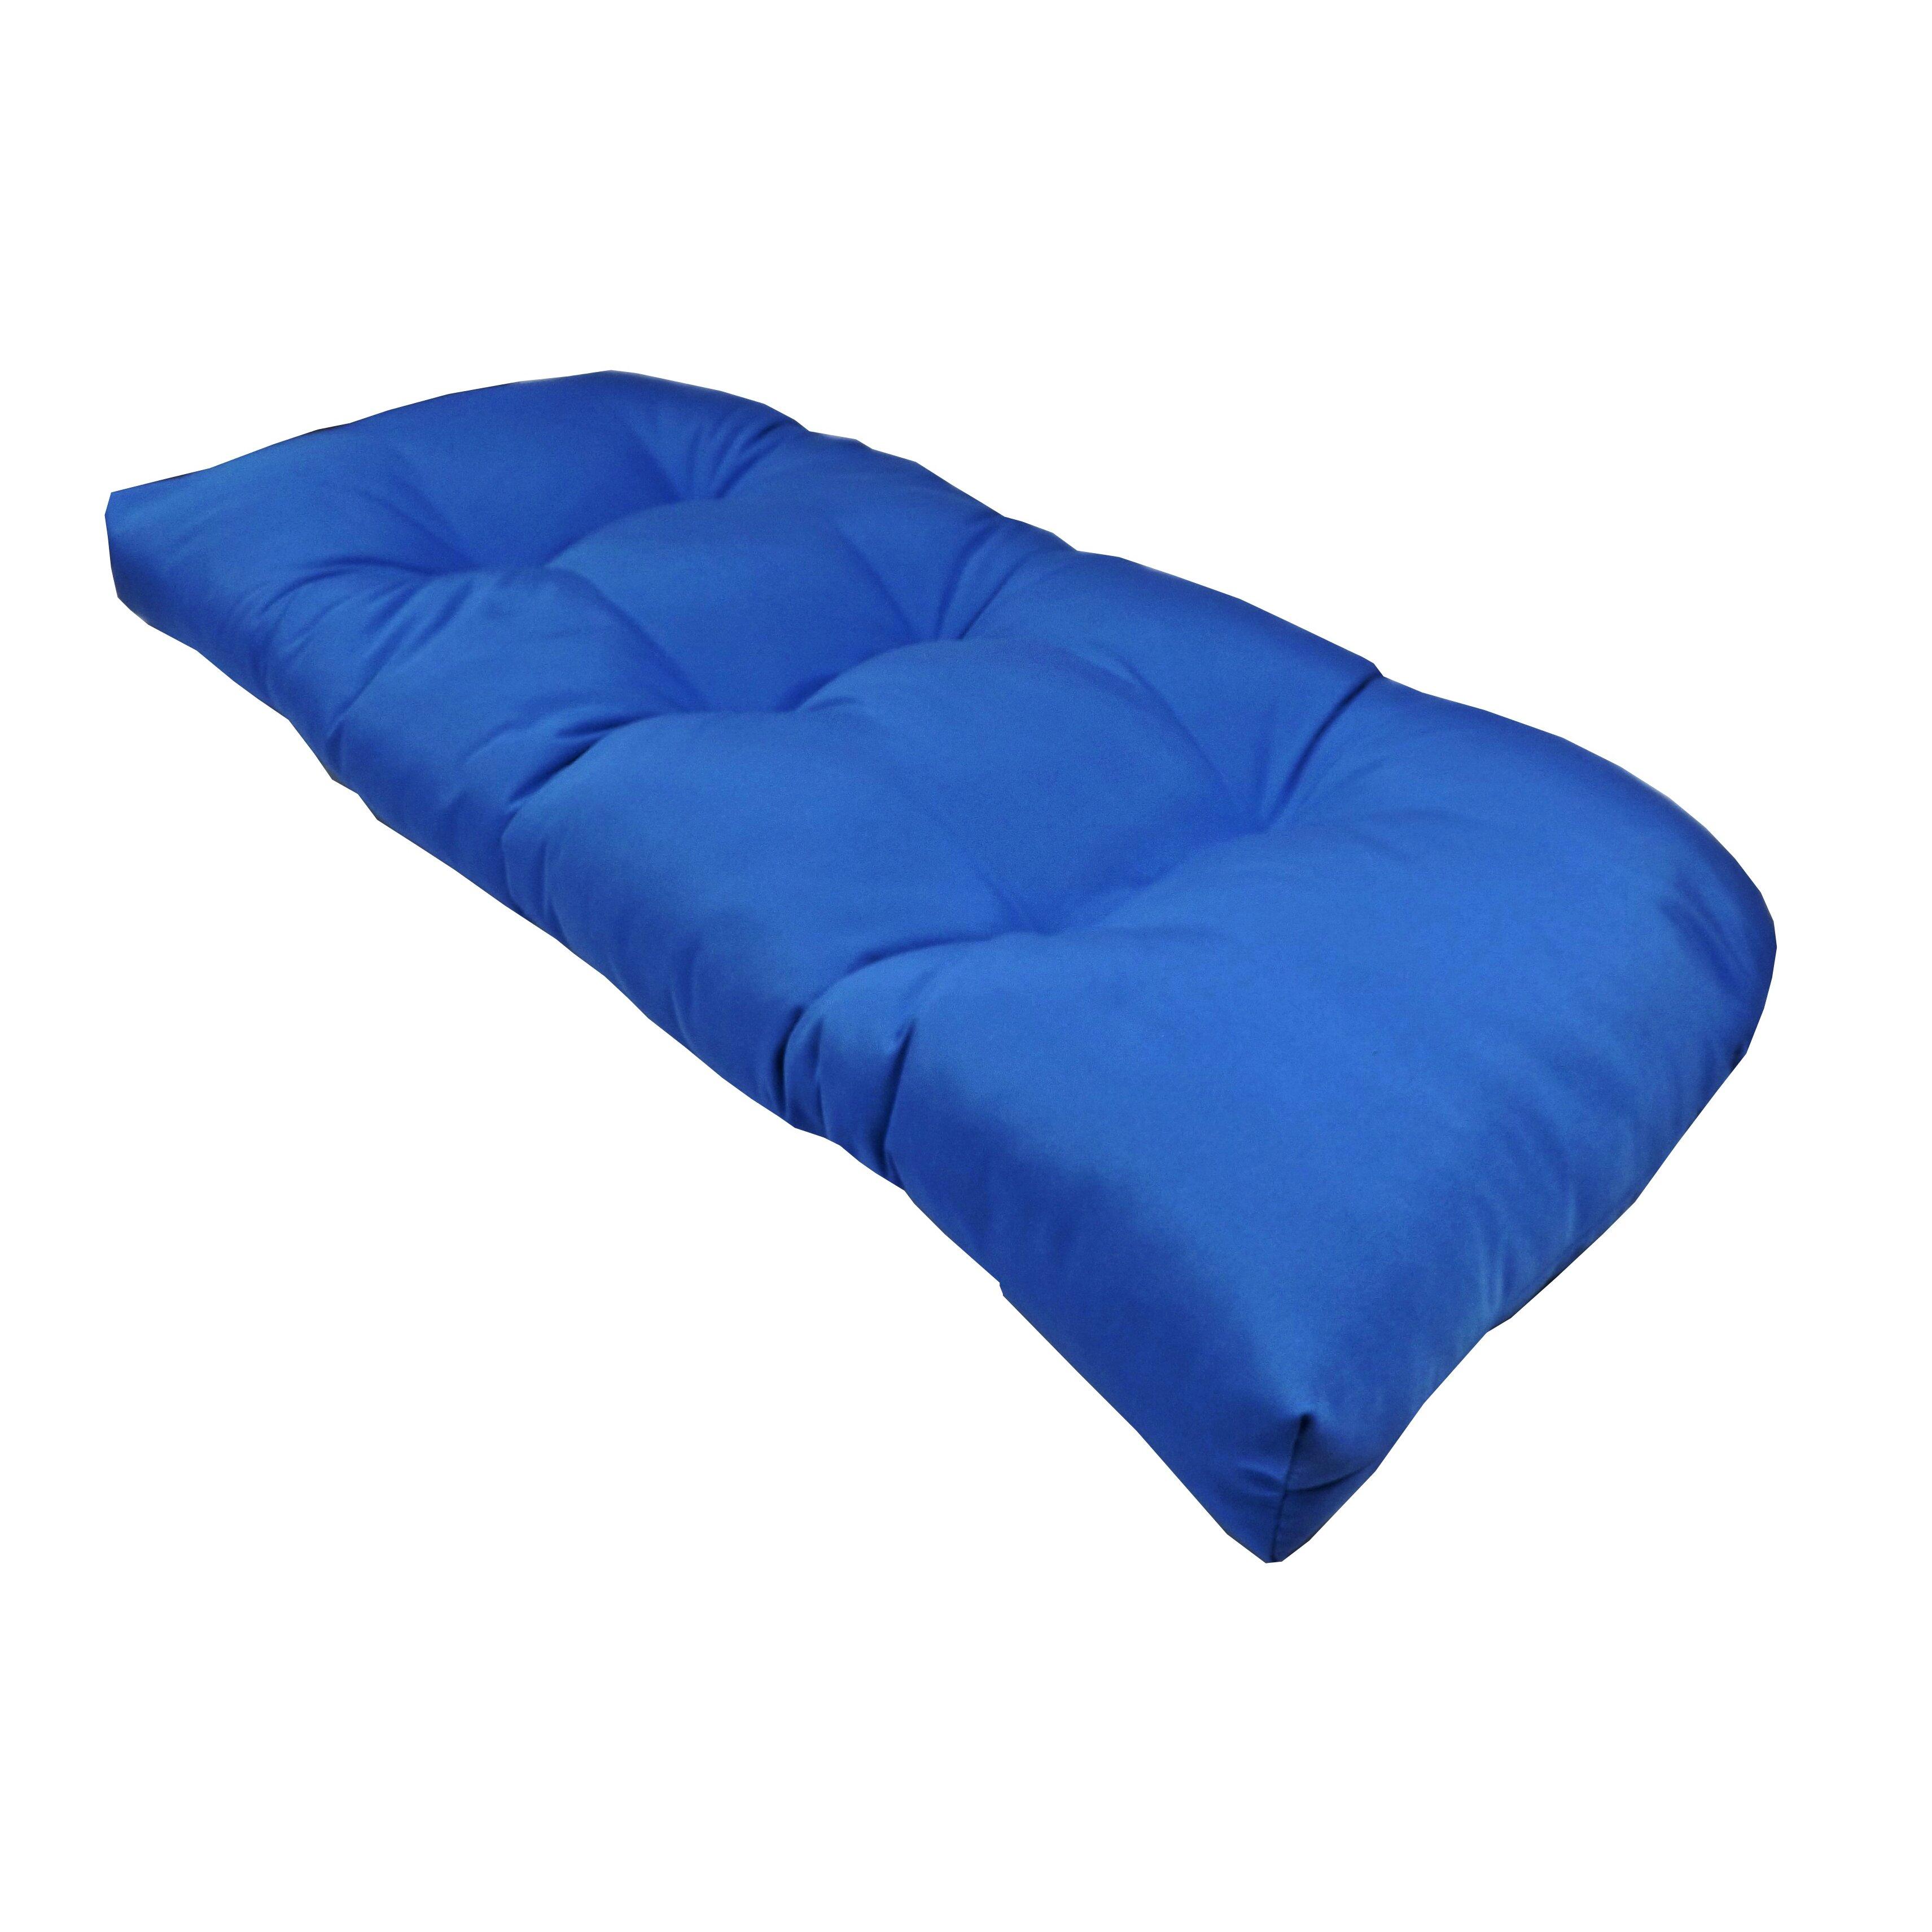 Cushion Pros Outdoor Sunbrella Loveseat Cushion Reviews Wayfair